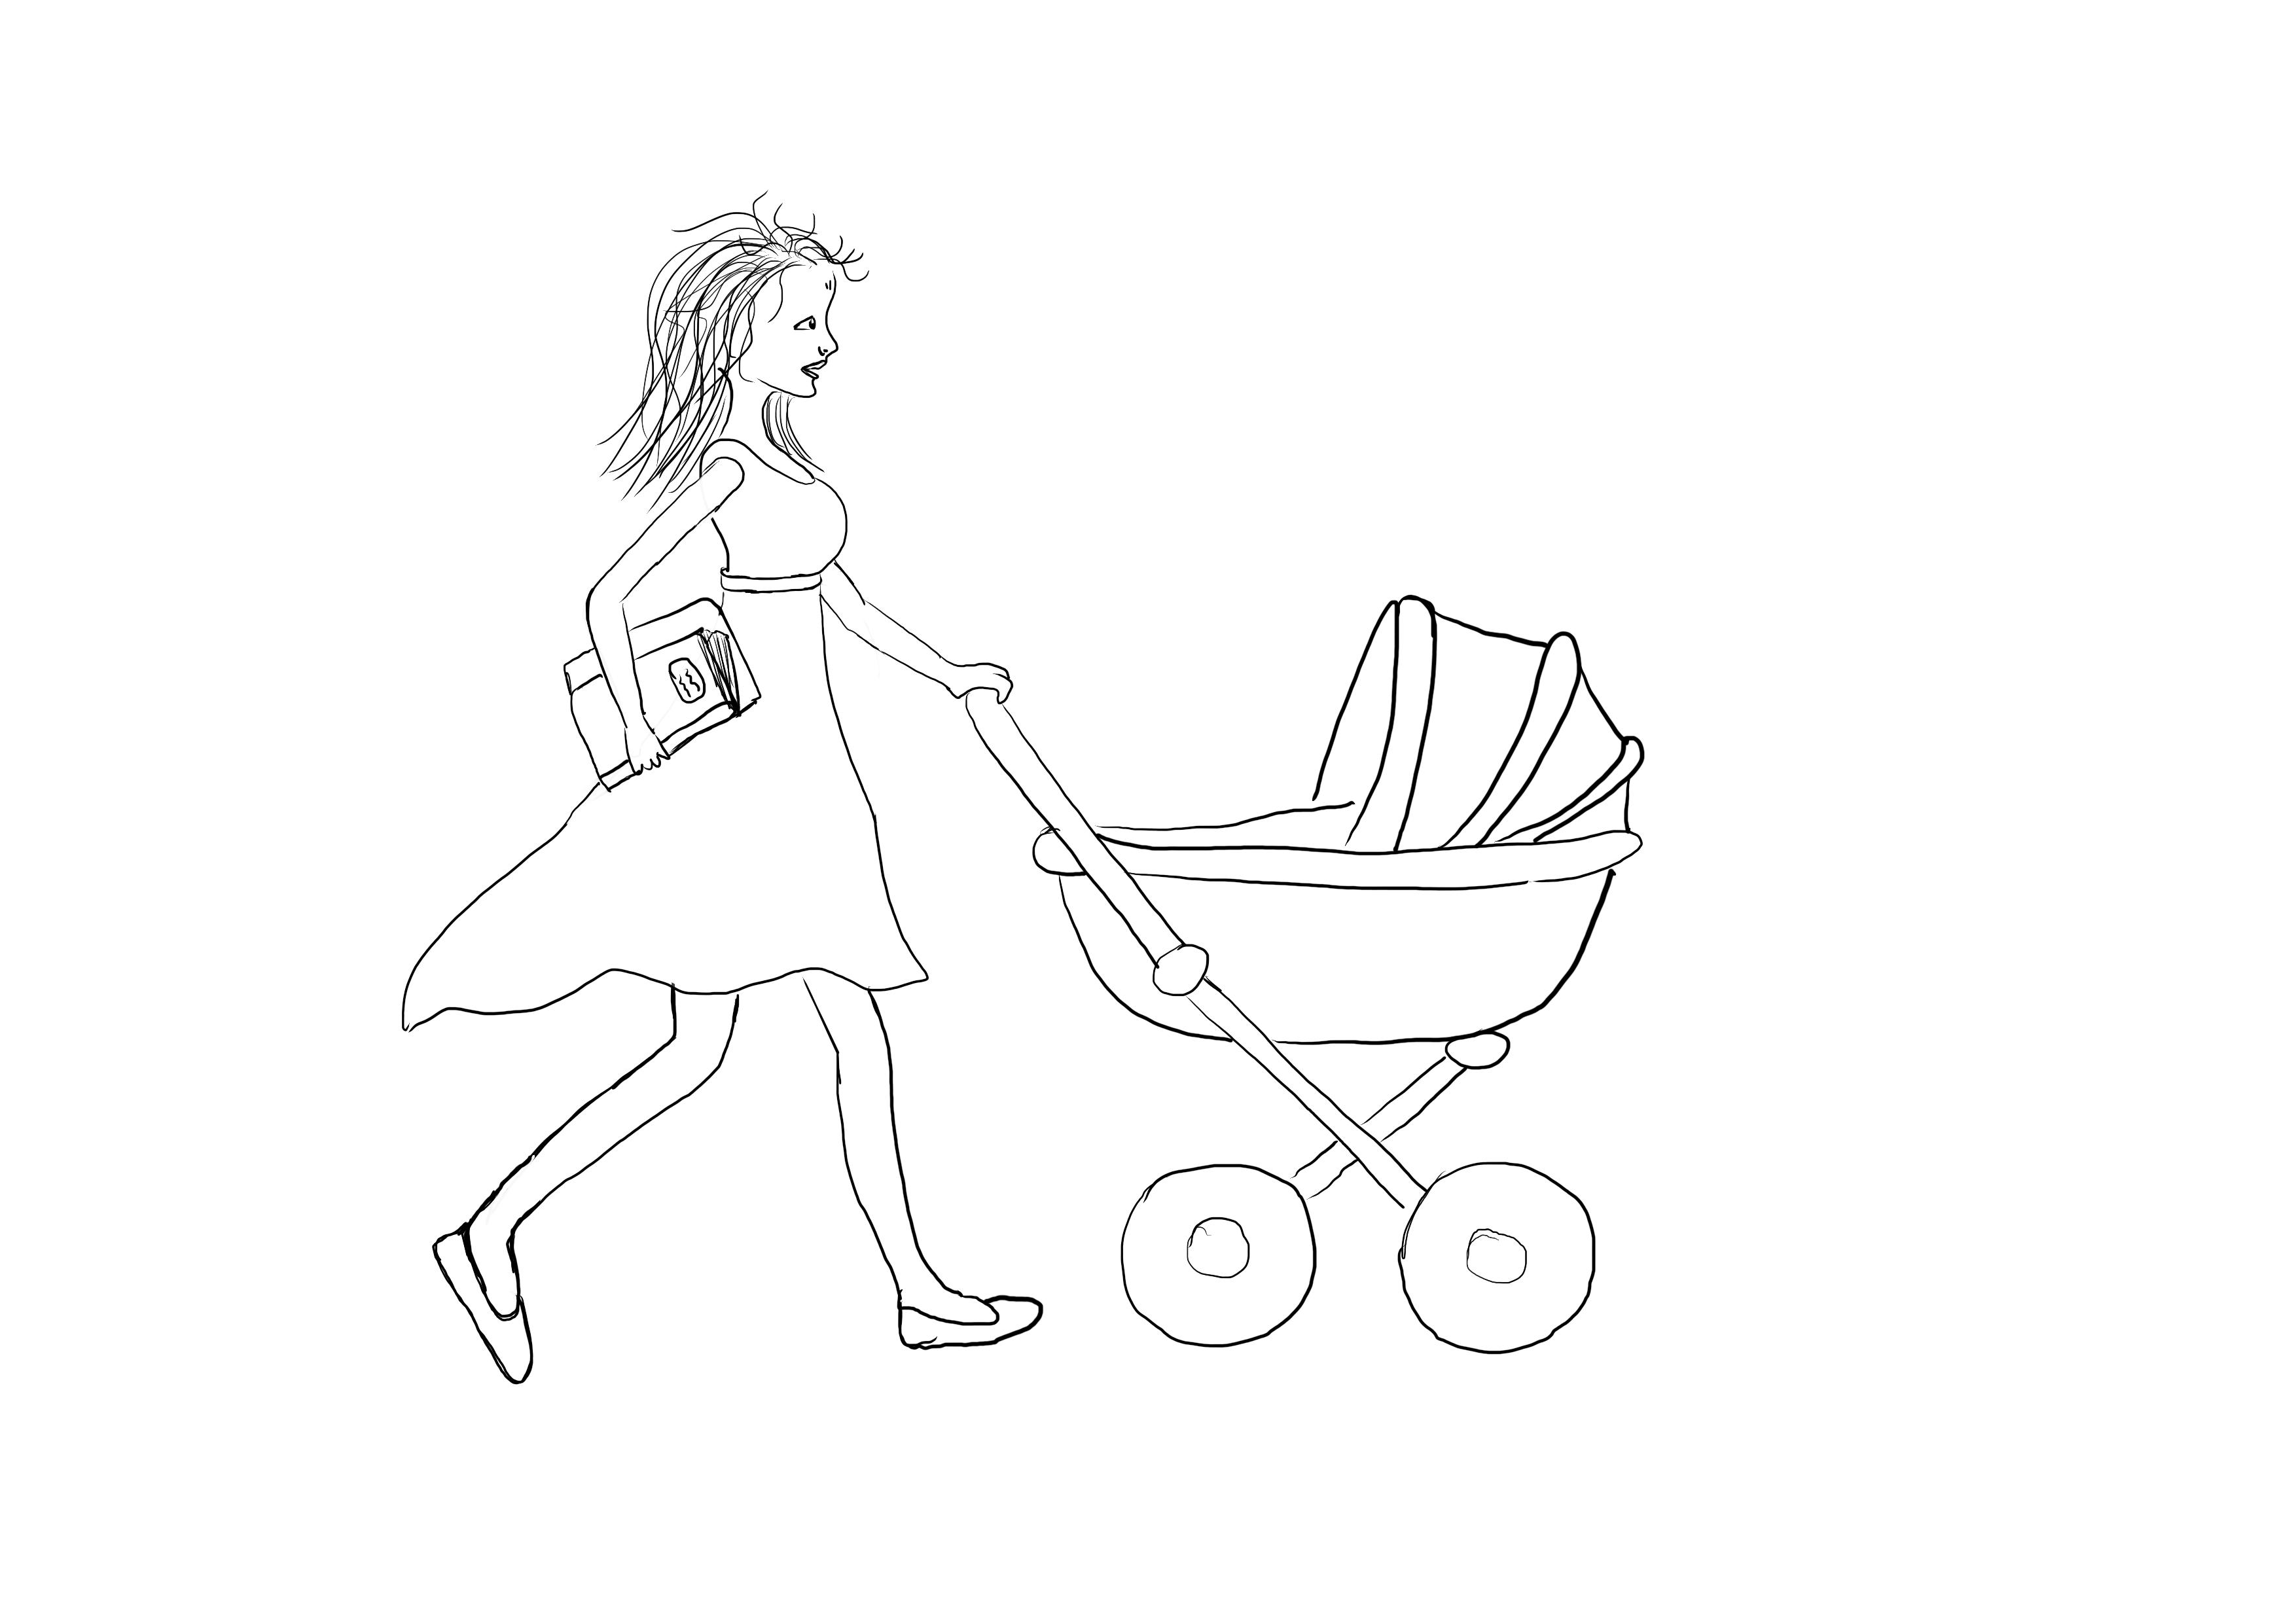 Mary Poppins, chůva, startup, matka, kočár